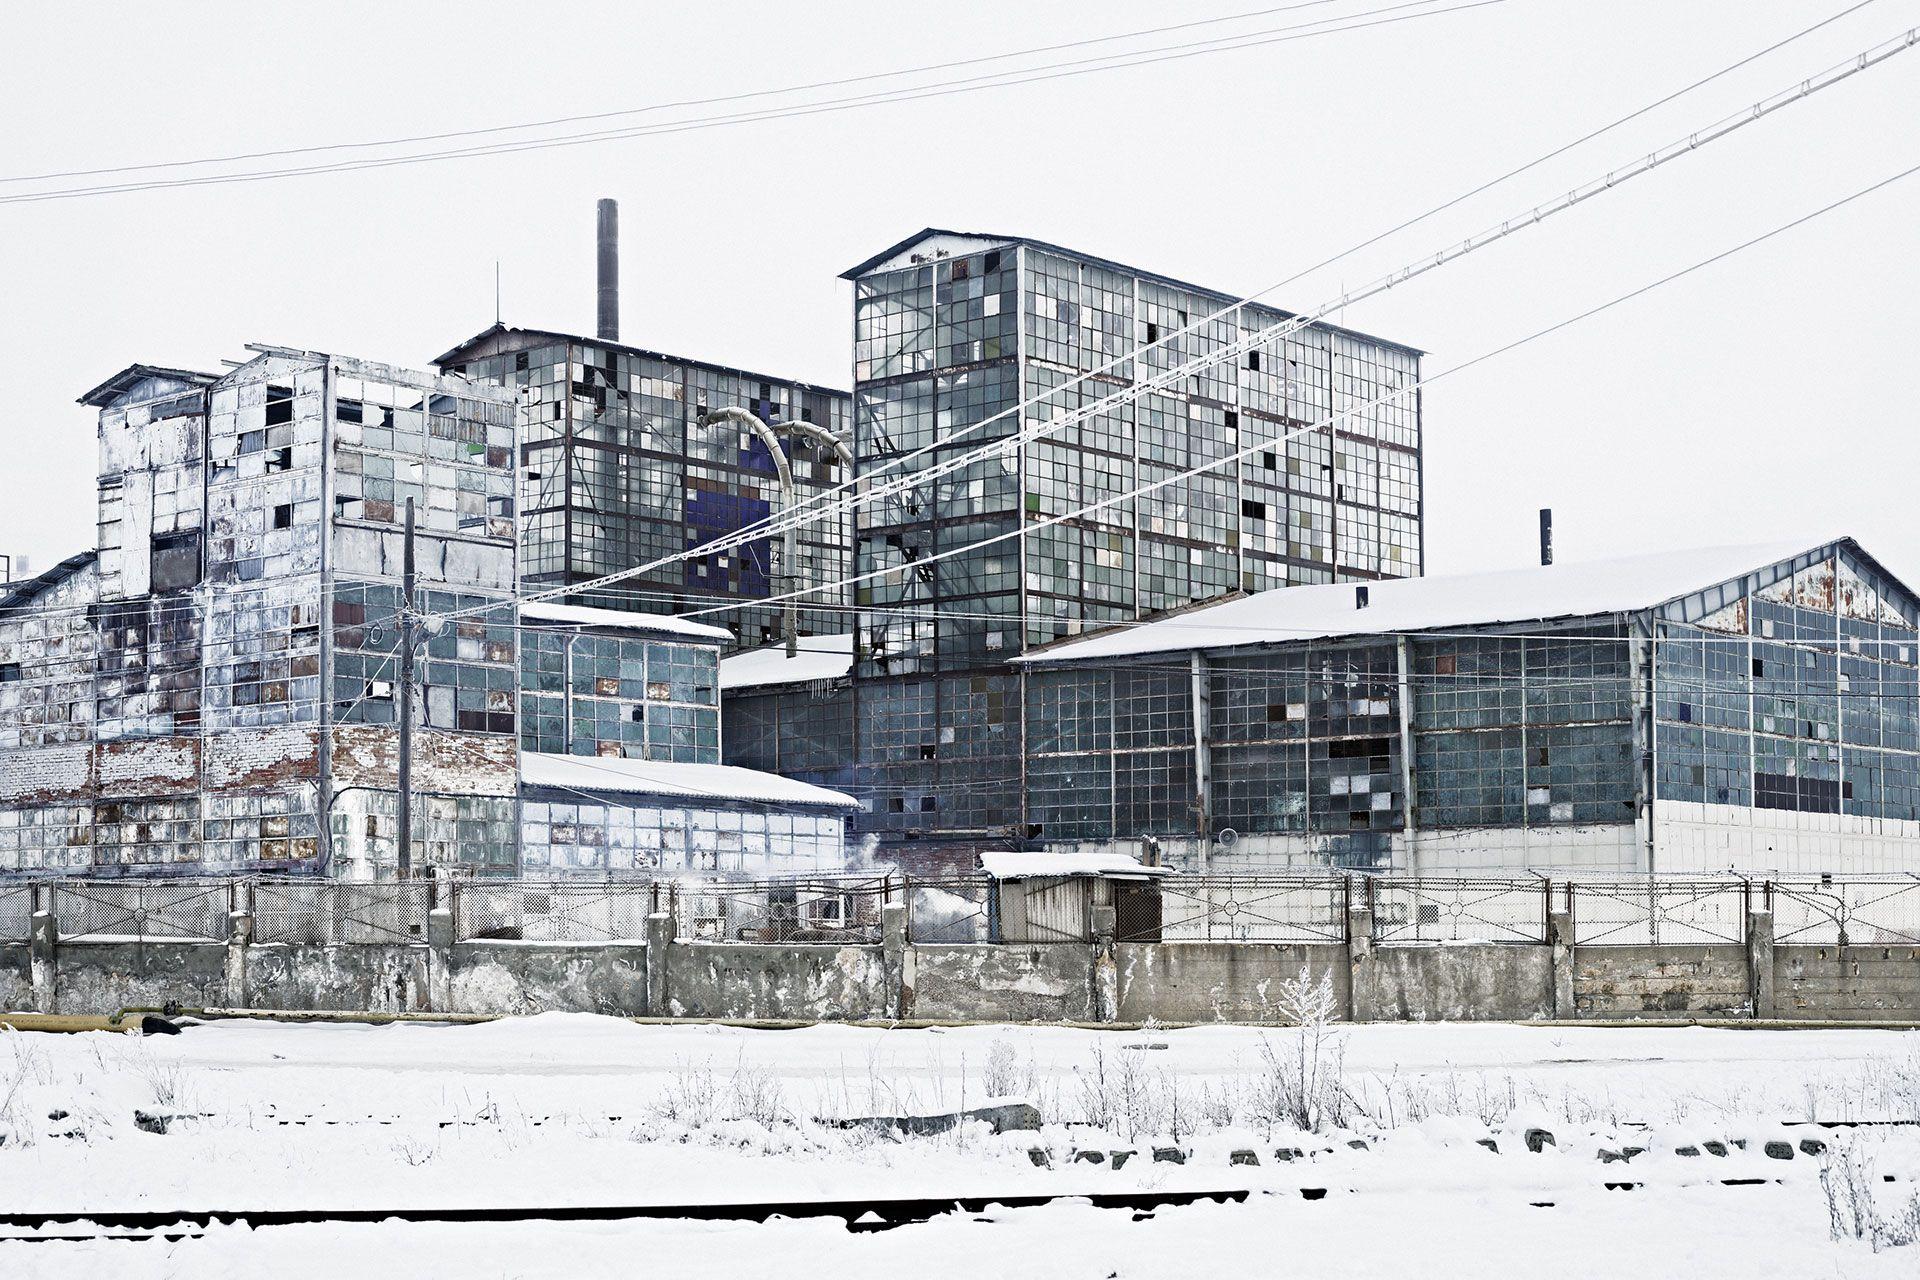 Sodium factory, Ocna Mureș, north-western Romania, 2012 Not quite forgotten: Stories of survival through the lens of Tamas Dezso - The Calvert Journal